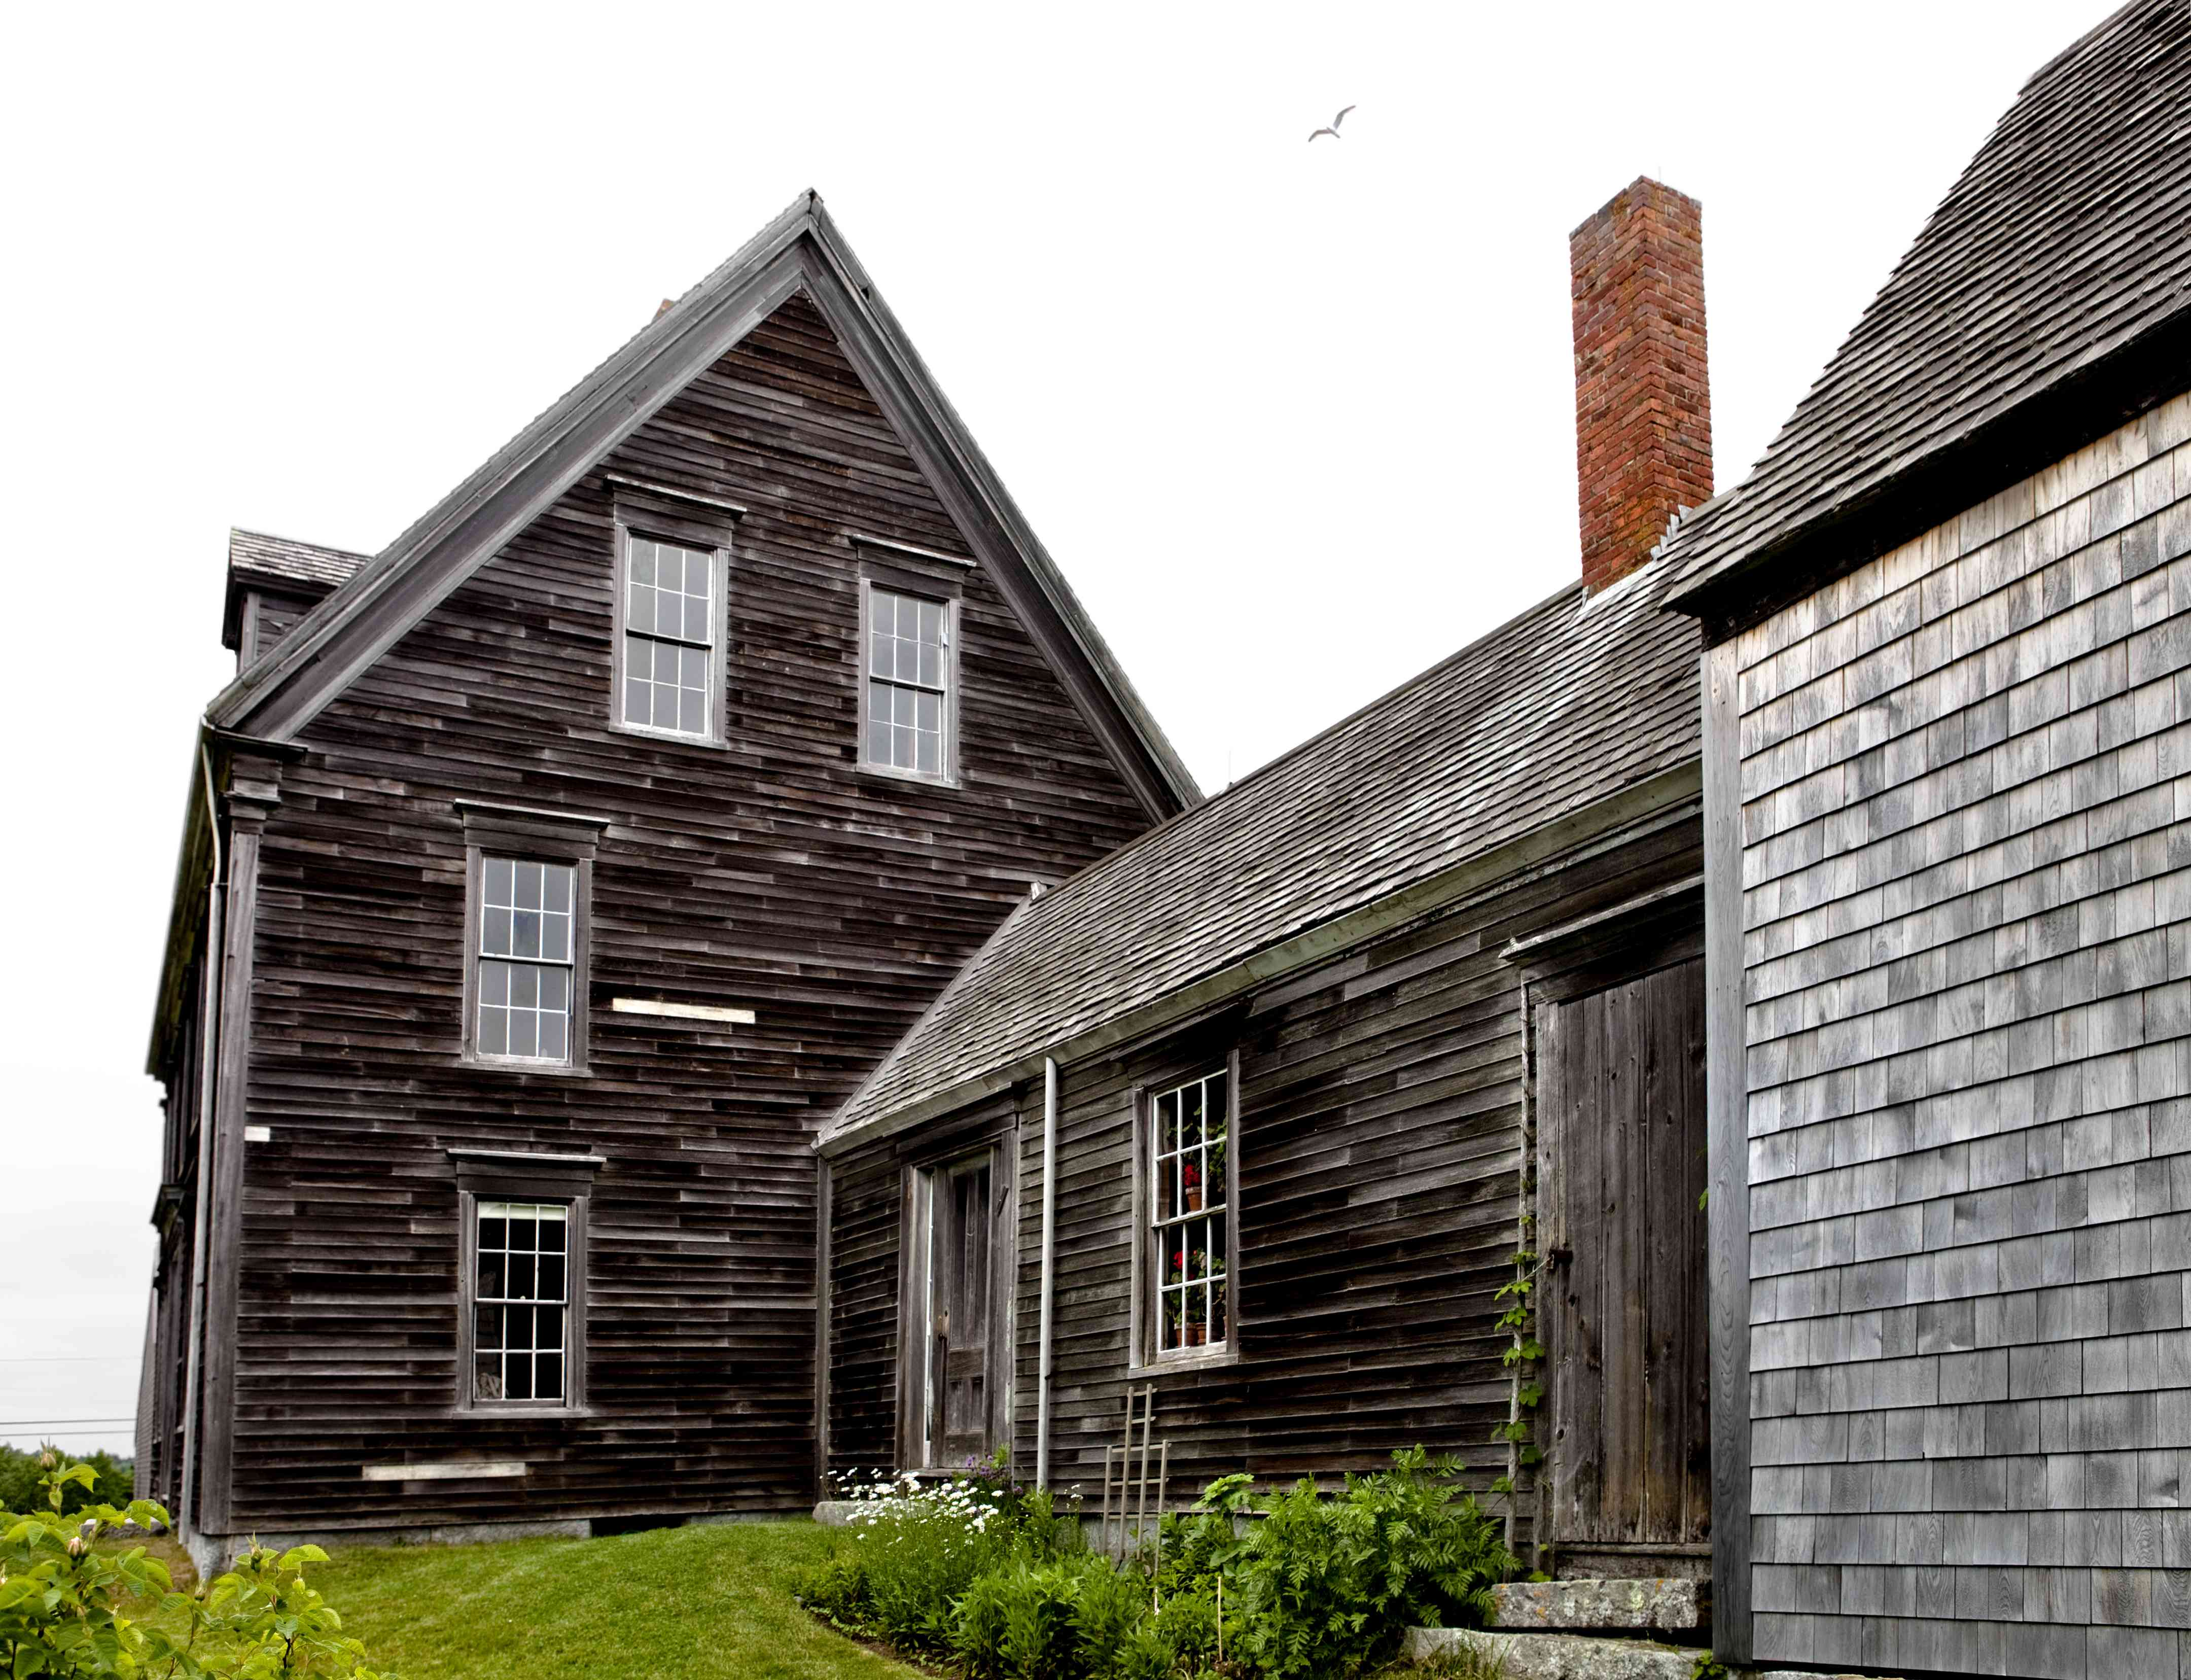 Olson House in Cushing Maine